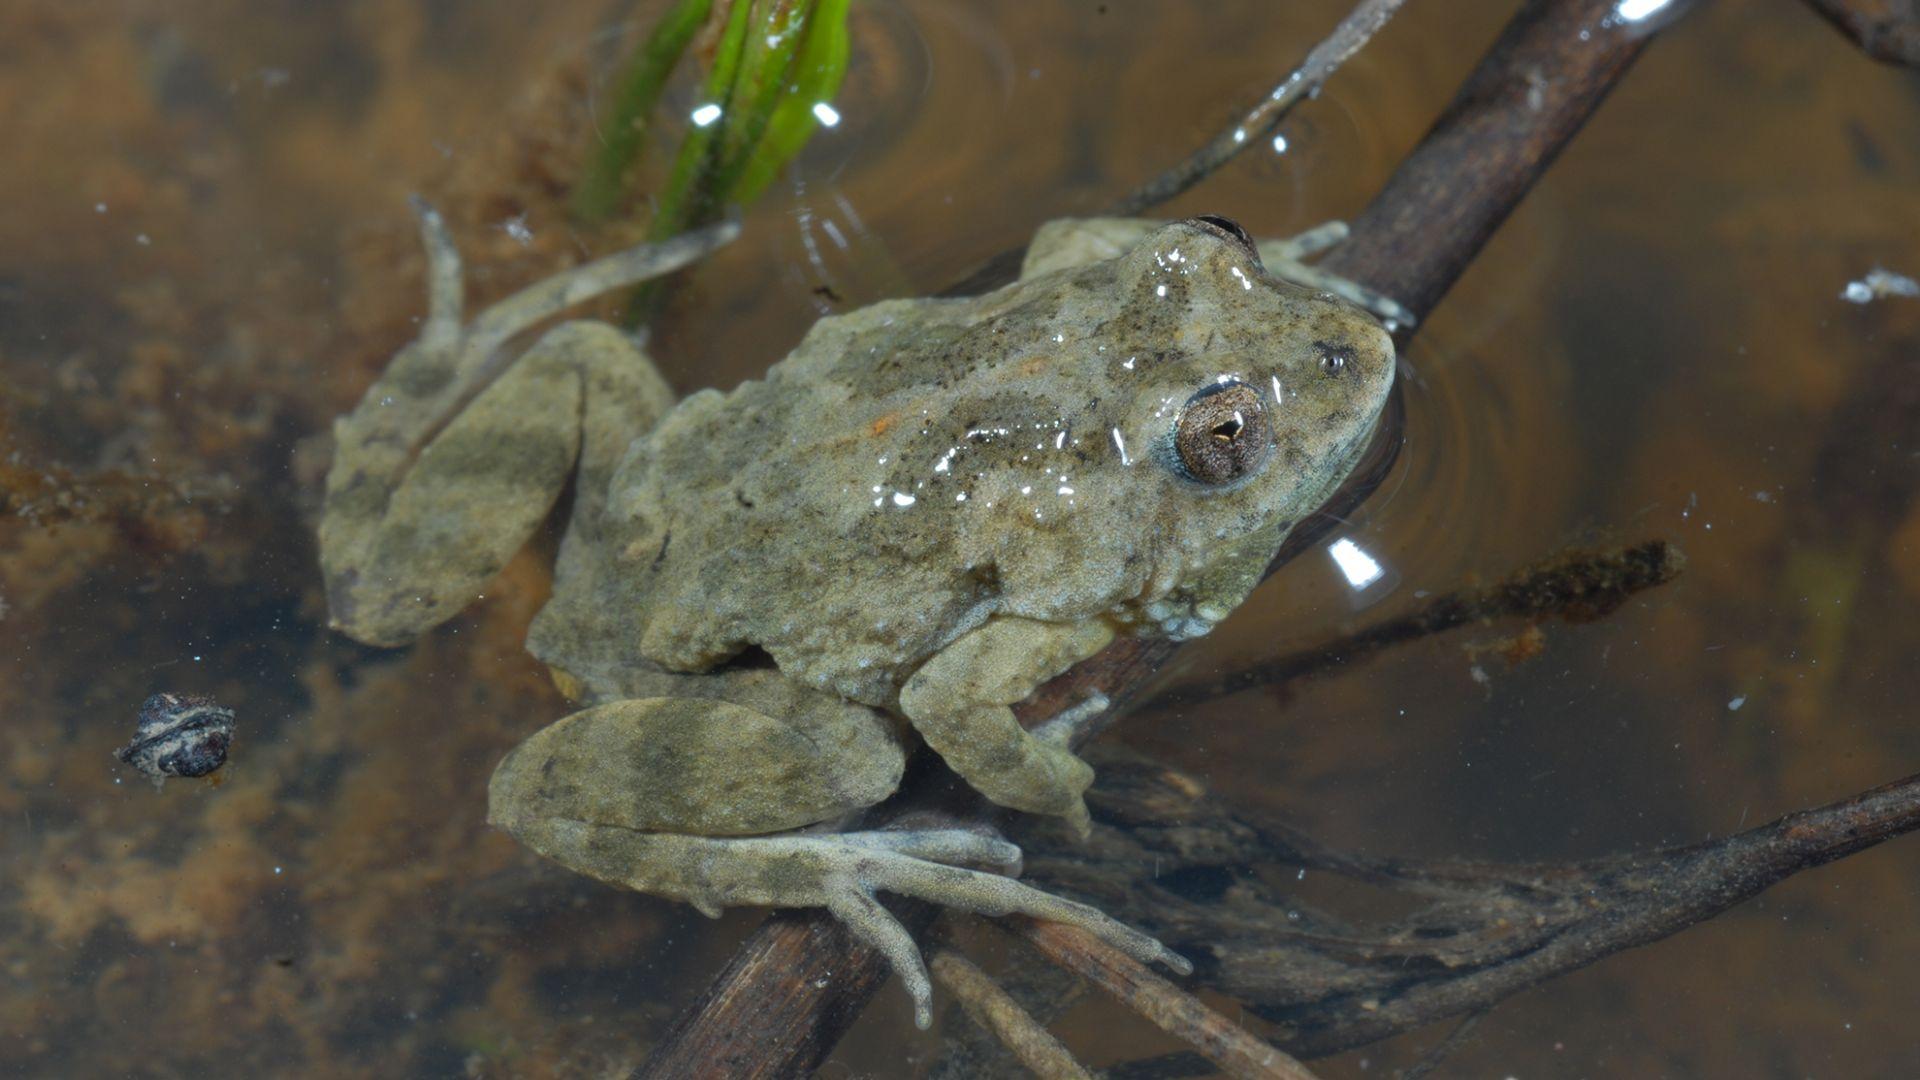 Charles Sturt helps Albury's endangered Sloane's froglet this National Tree Day